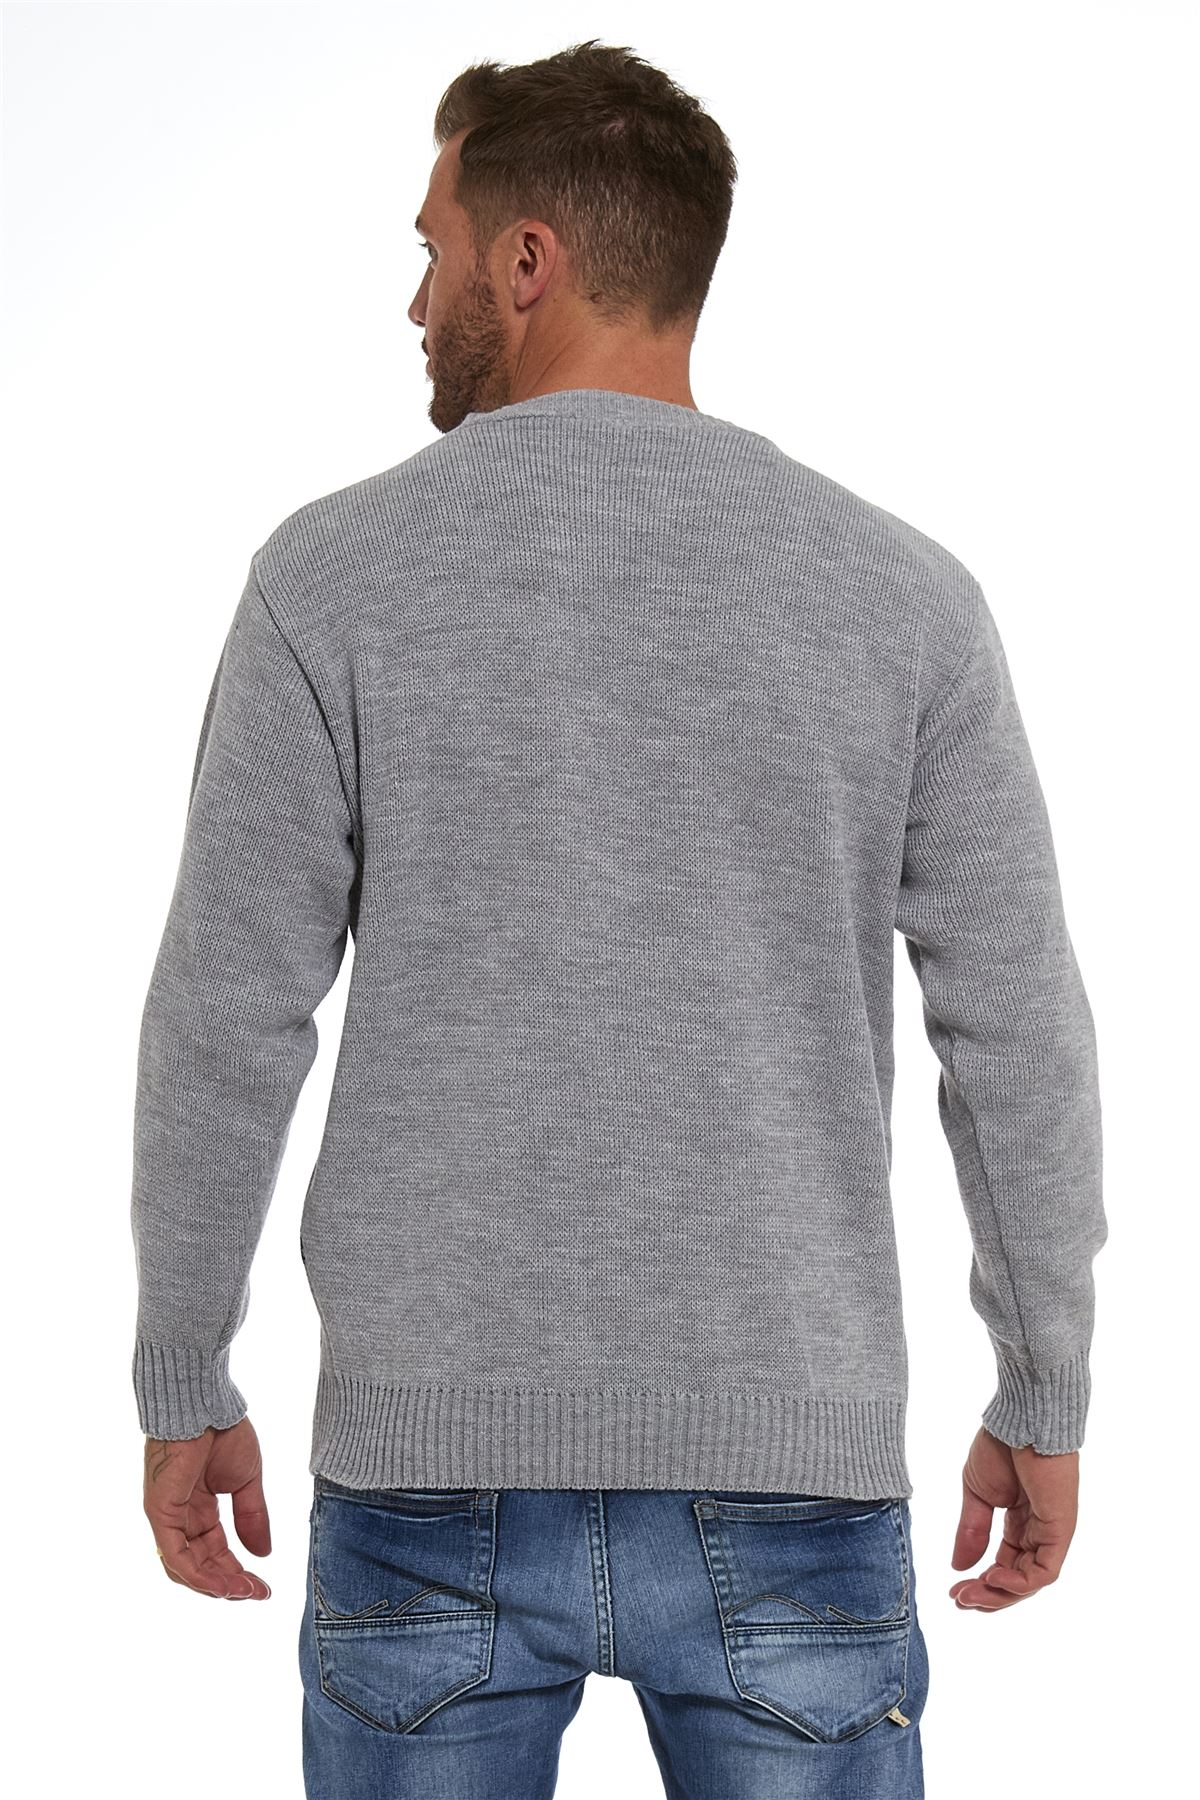 Celebrity Sweaters Online Shopping | Celebrity Sweaters ...